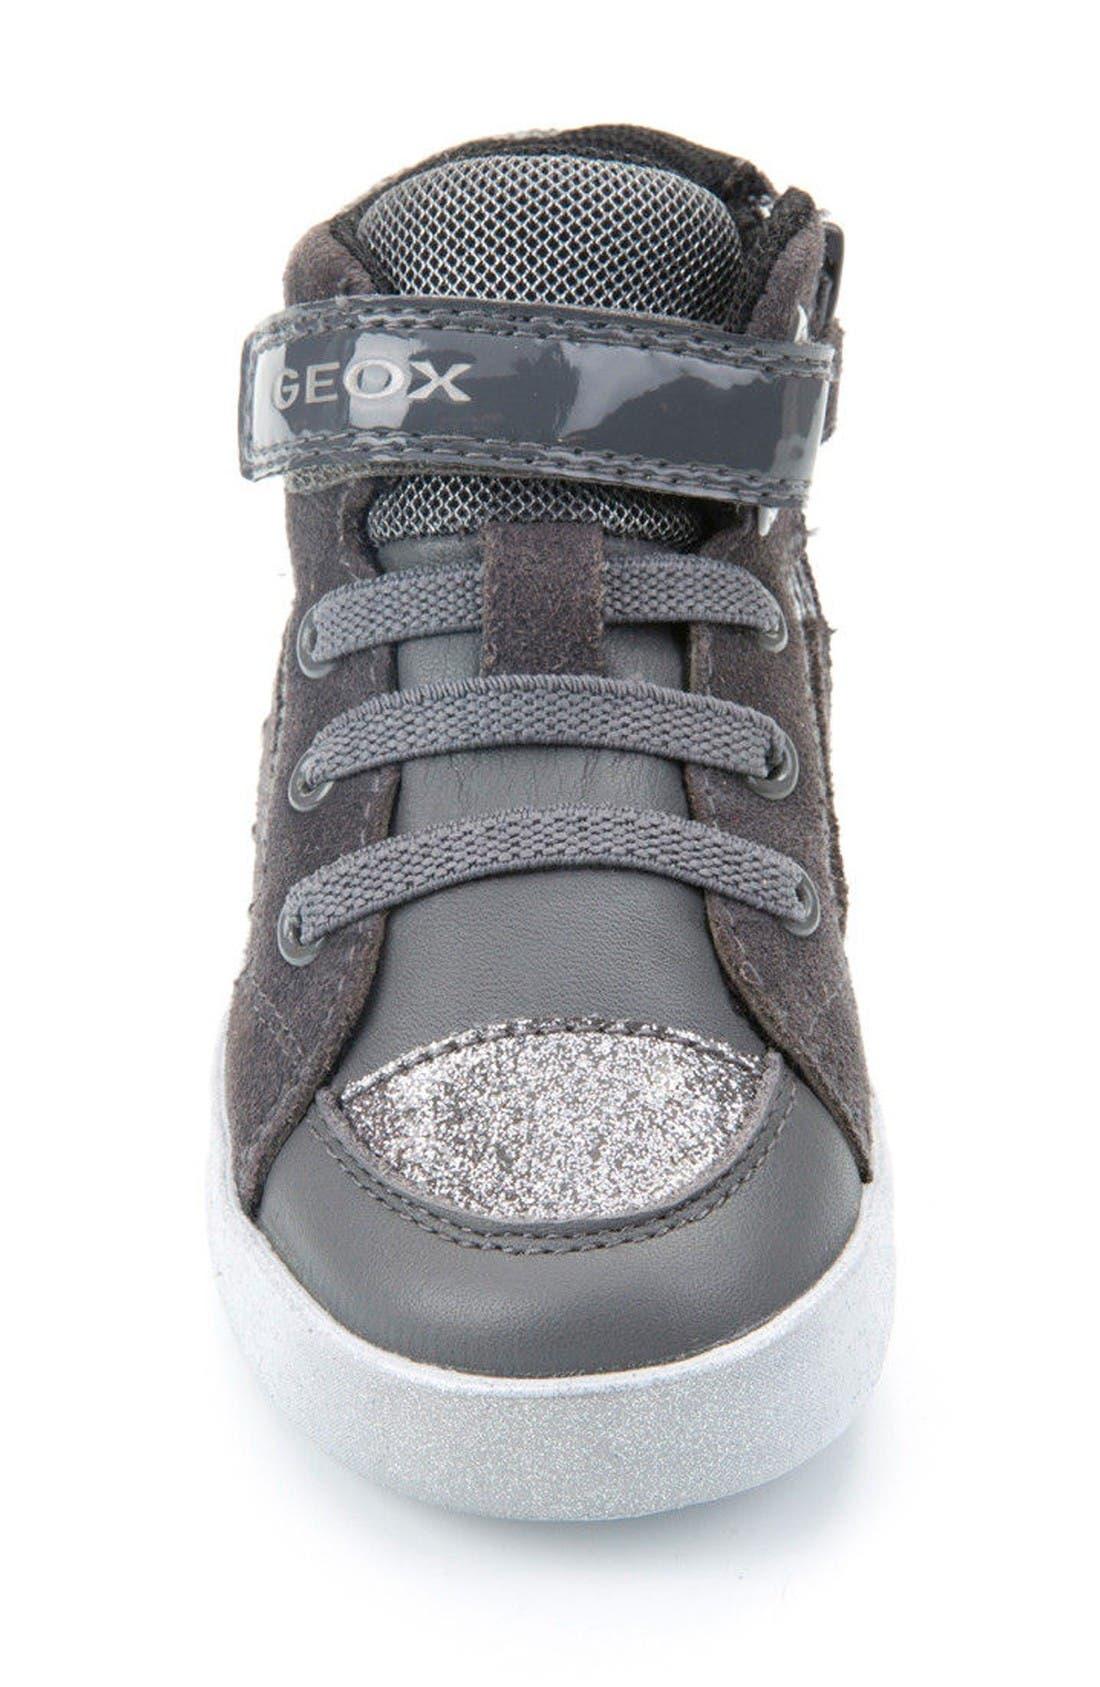 Alternate Image 3  - Geox Kiwi Studded High Top Sneaker (Walker & Toddler)